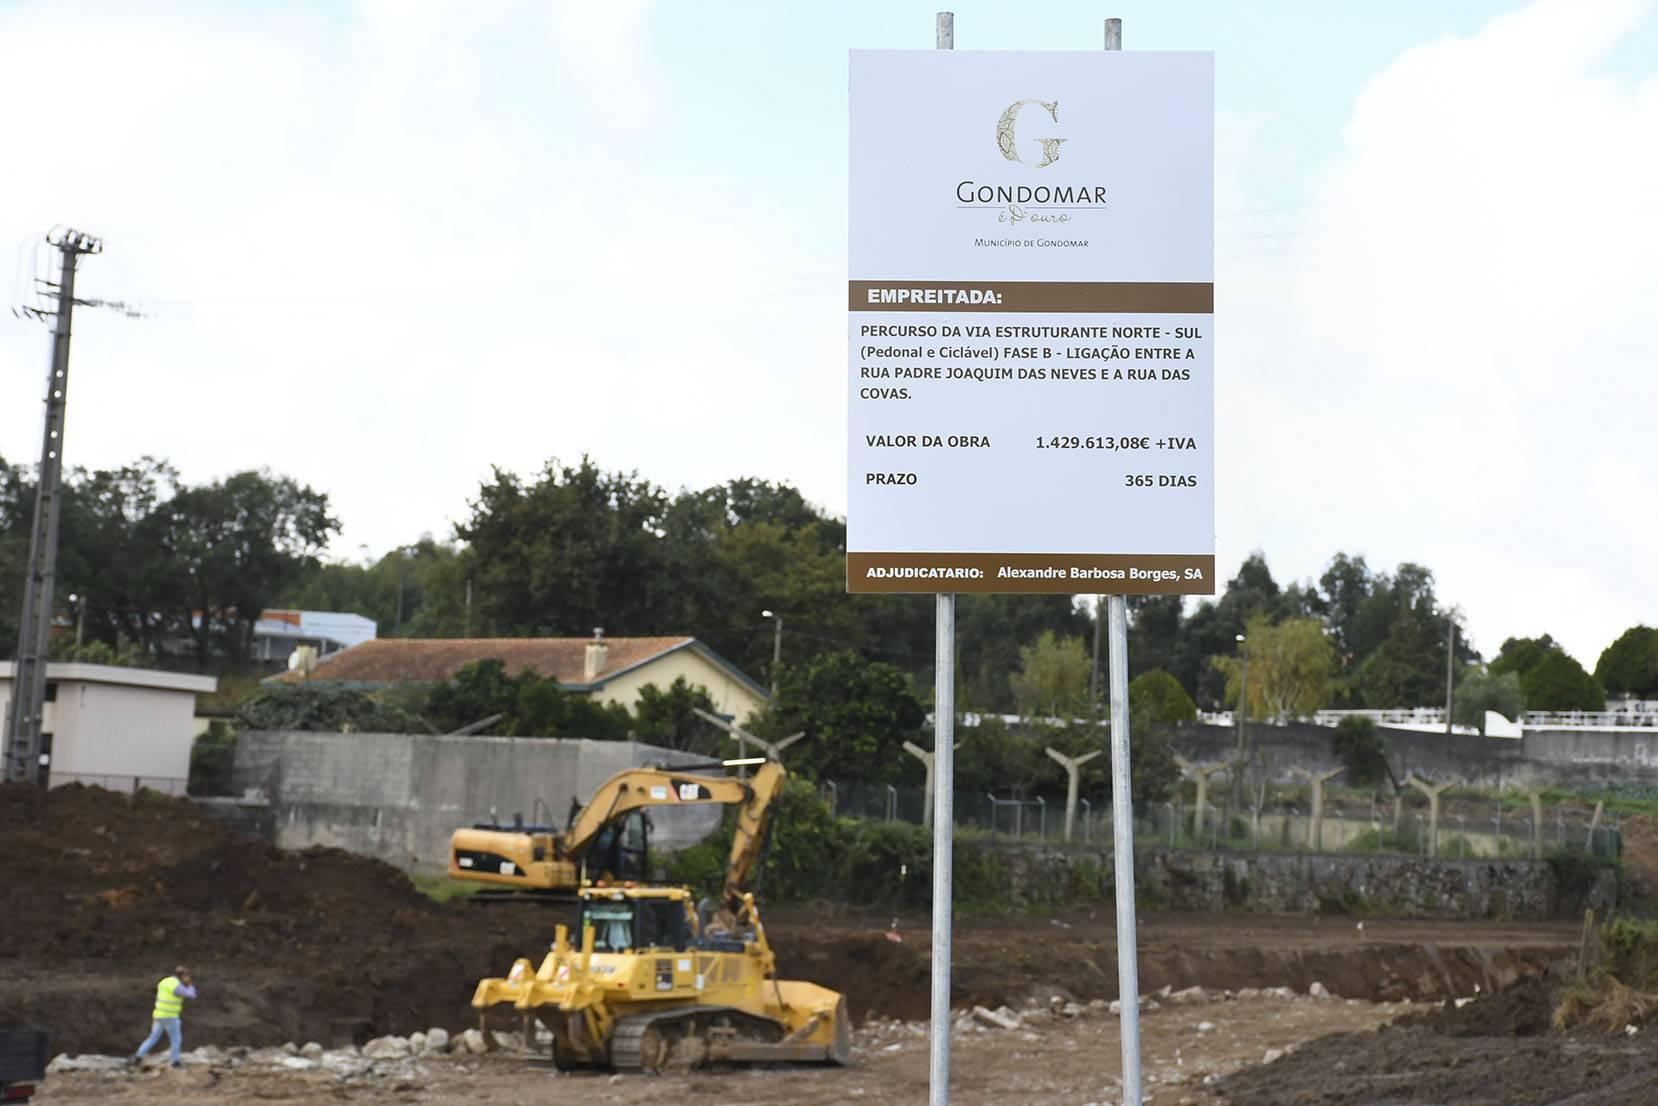 gondomar, inicio de obras da via estroturante norte_sul 06/10/2020 j.paulo coutinho / CMG